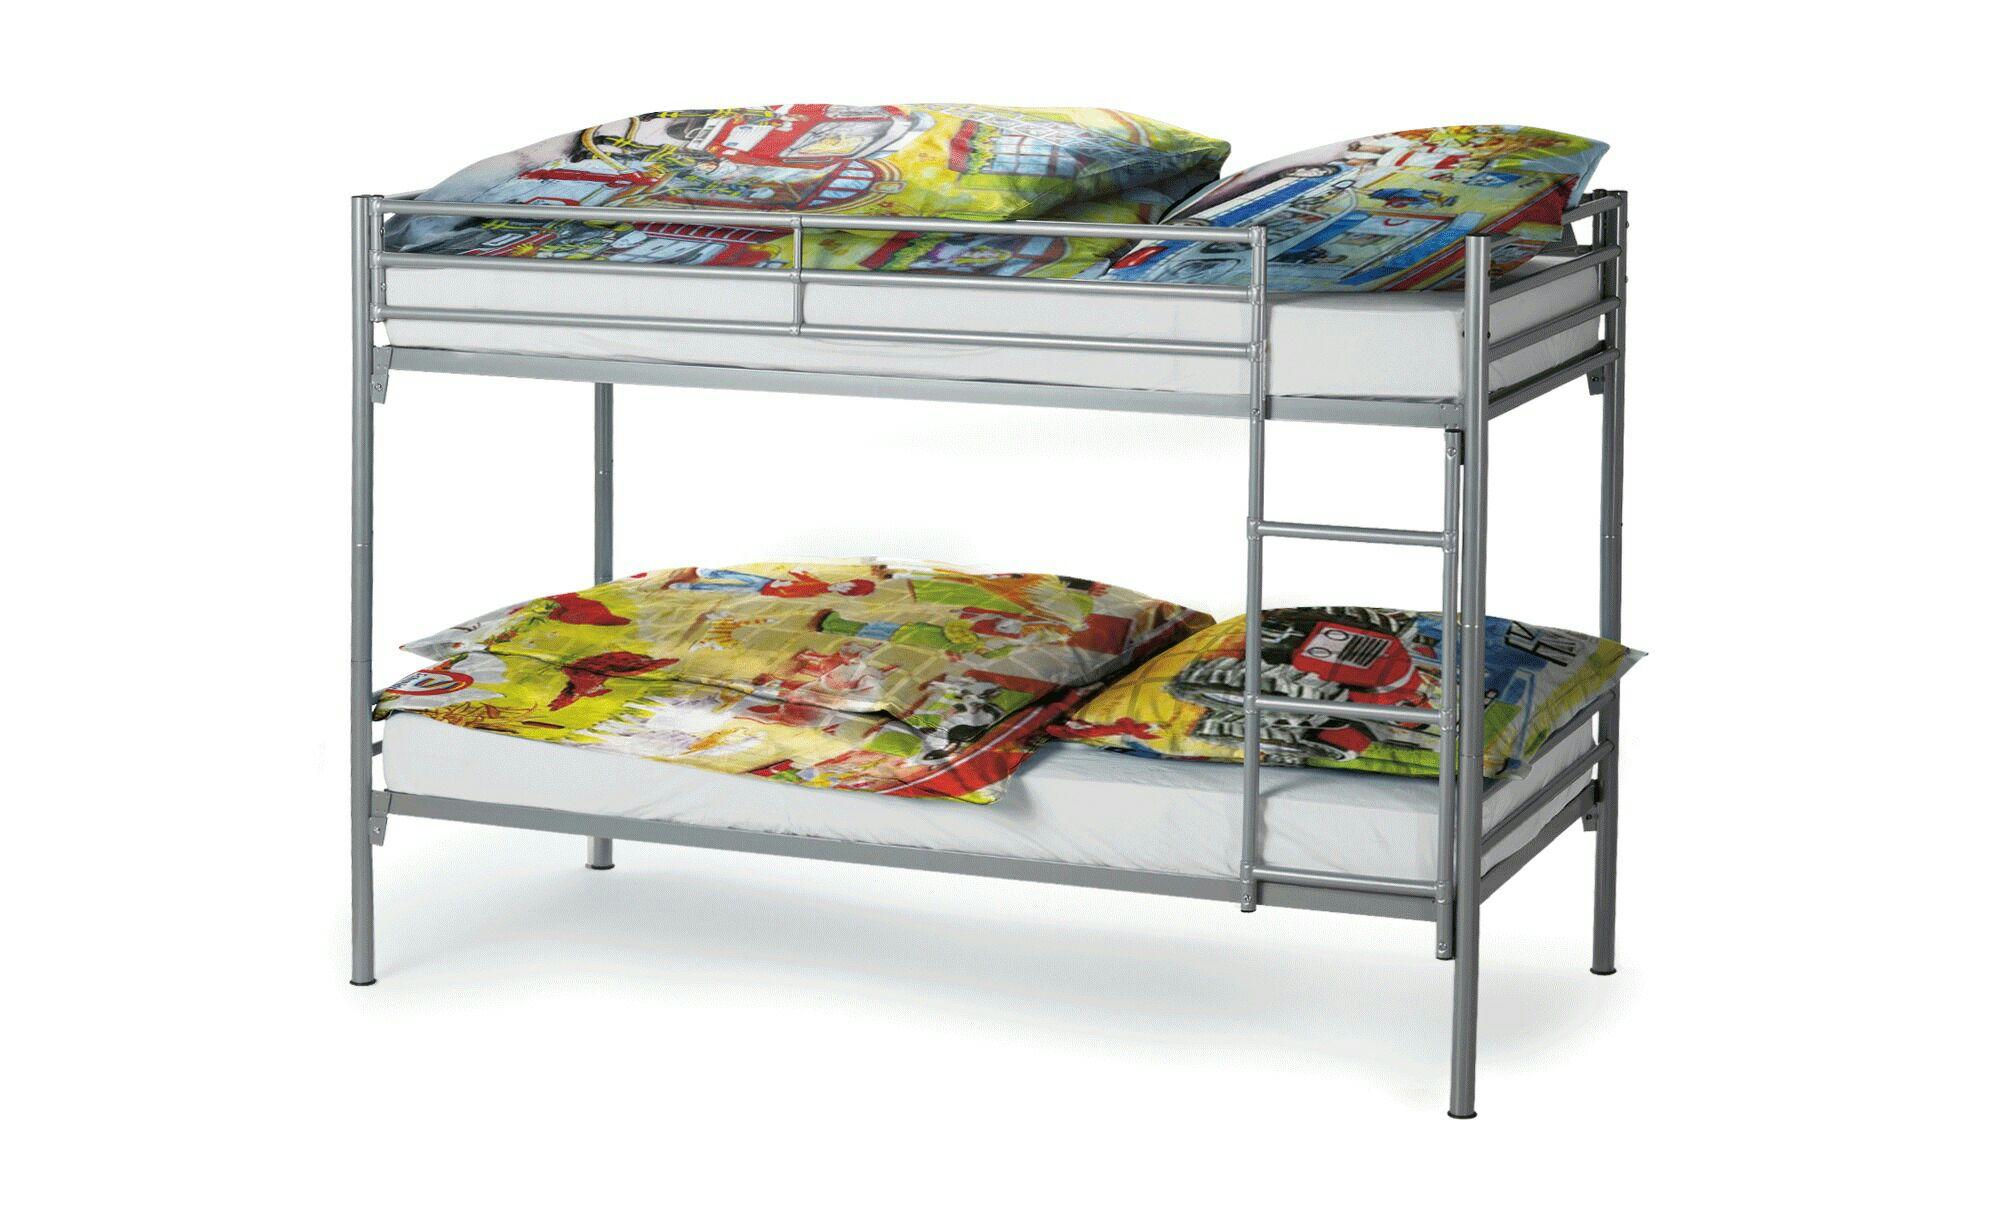 doppelbett etagenbett aus metall f r 39 offline sconto online 26. Black Bedroom Furniture Sets. Home Design Ideas